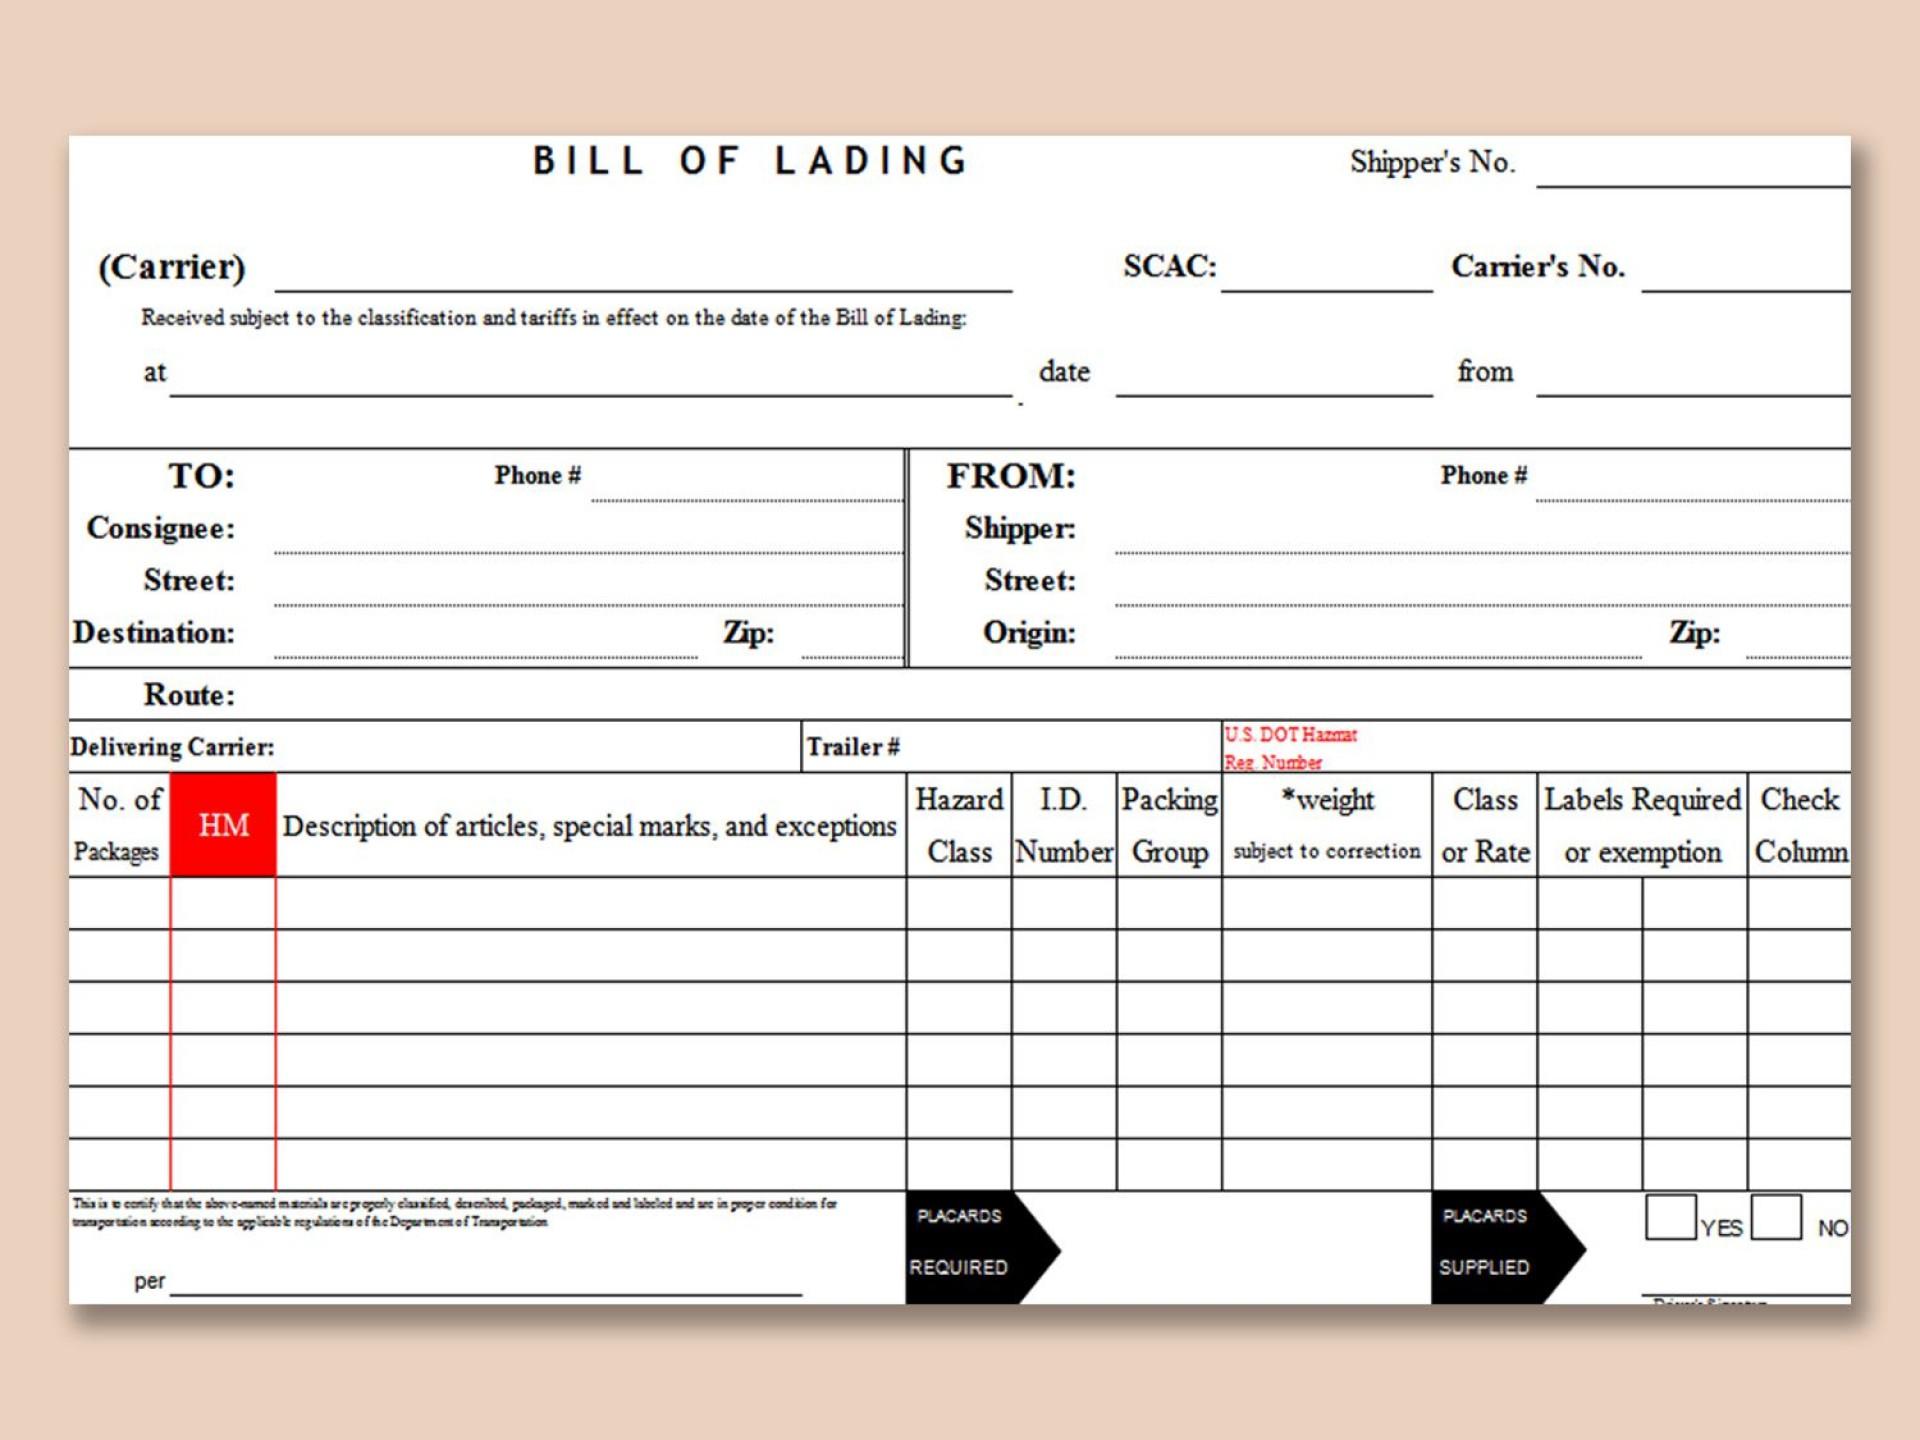 004 Impressive Bill Of Lading Template Microsoft Word High Resolution 1920